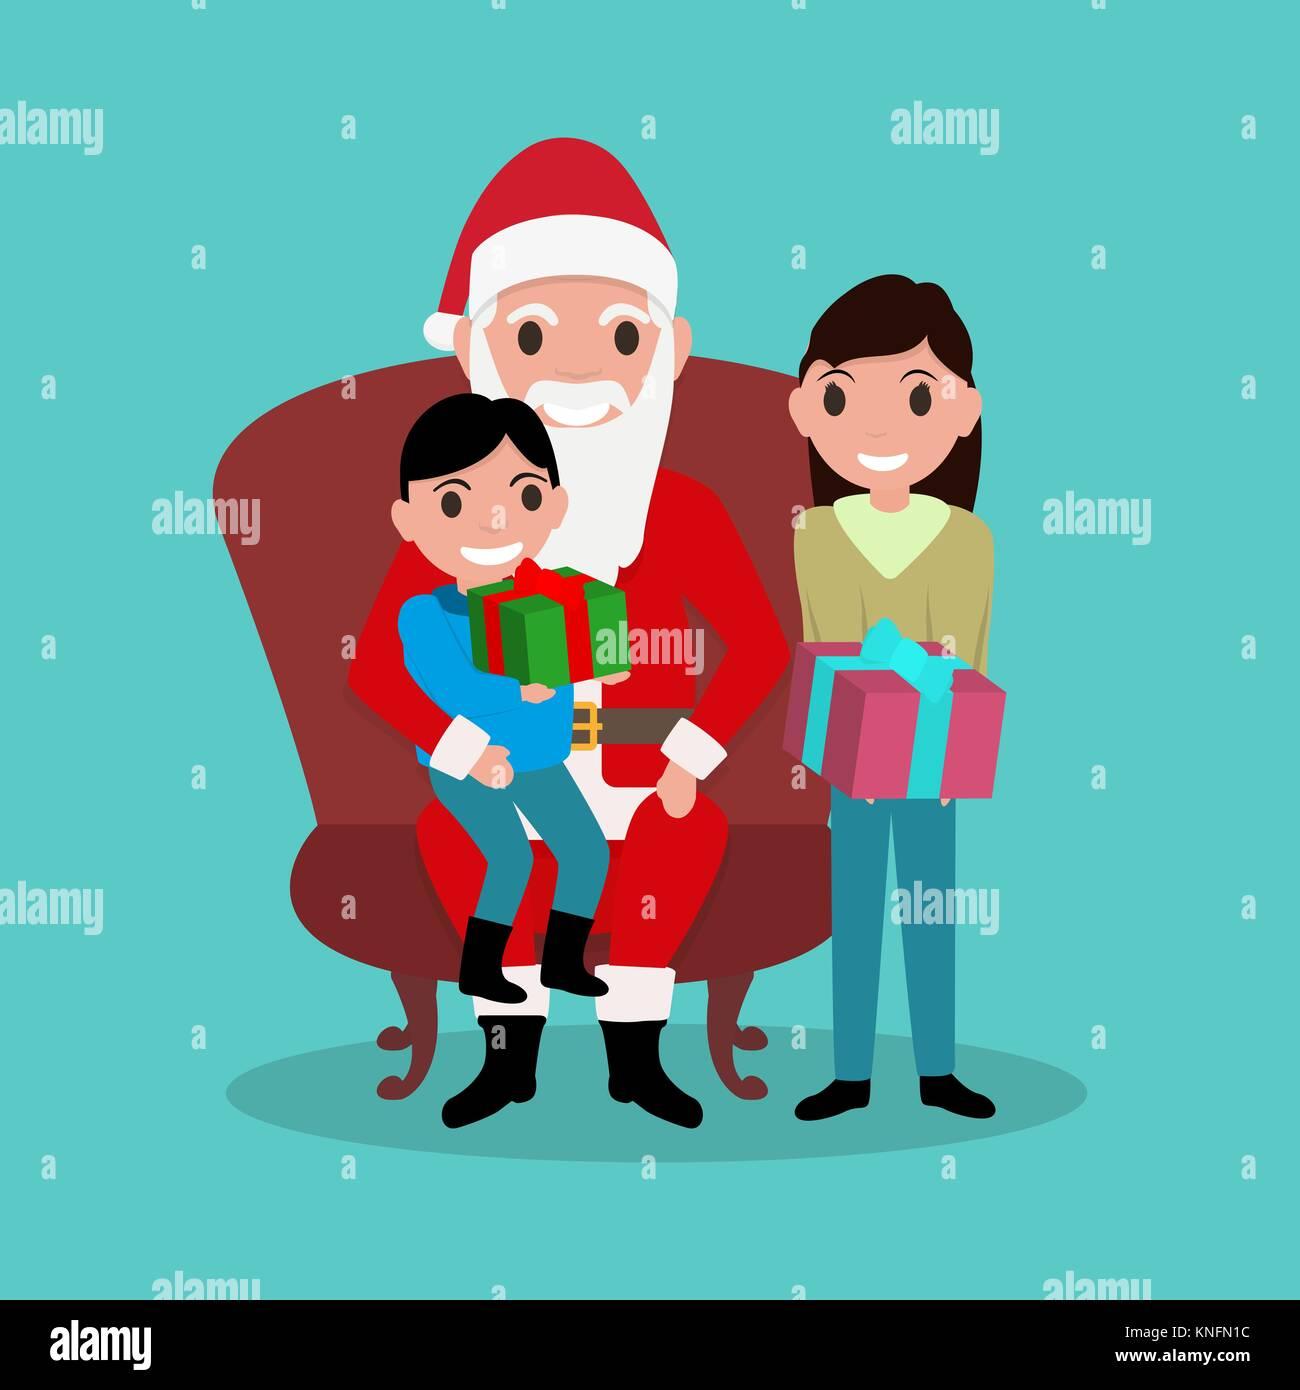 Cartoon Santa Claus sitting in chair with children - Stock Vector